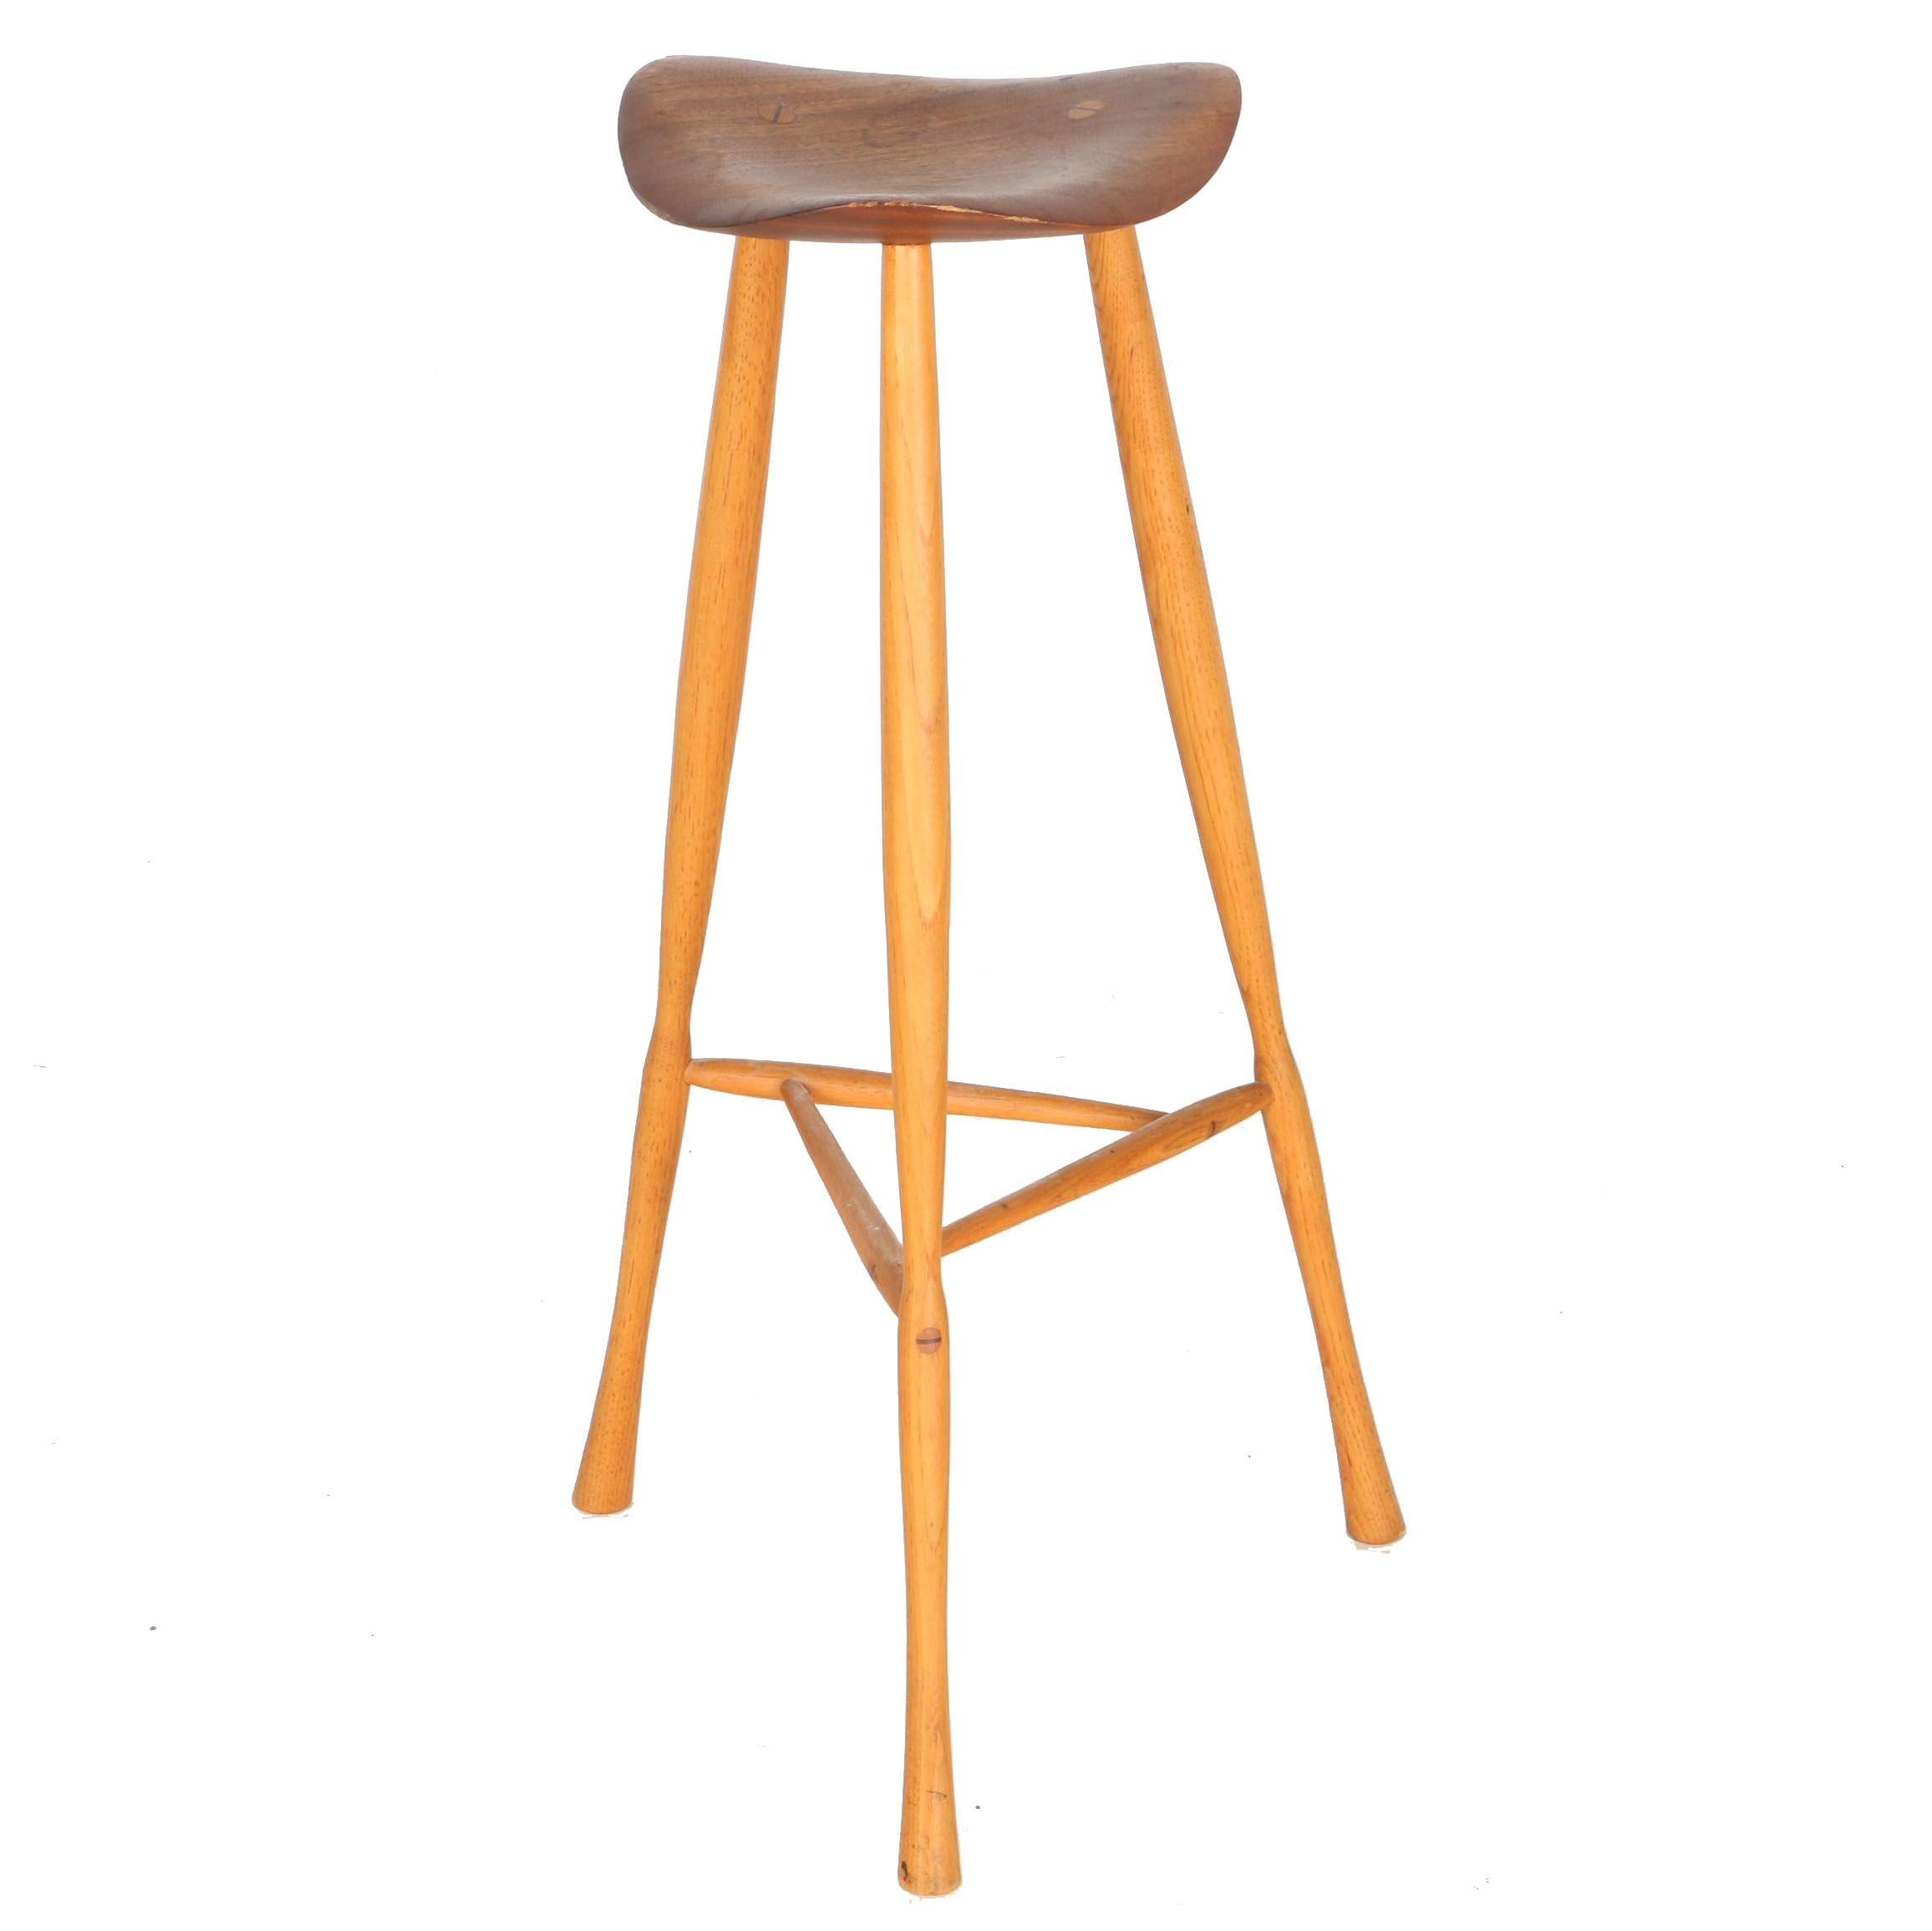 mid century modern teak bar stool by karl seemuller